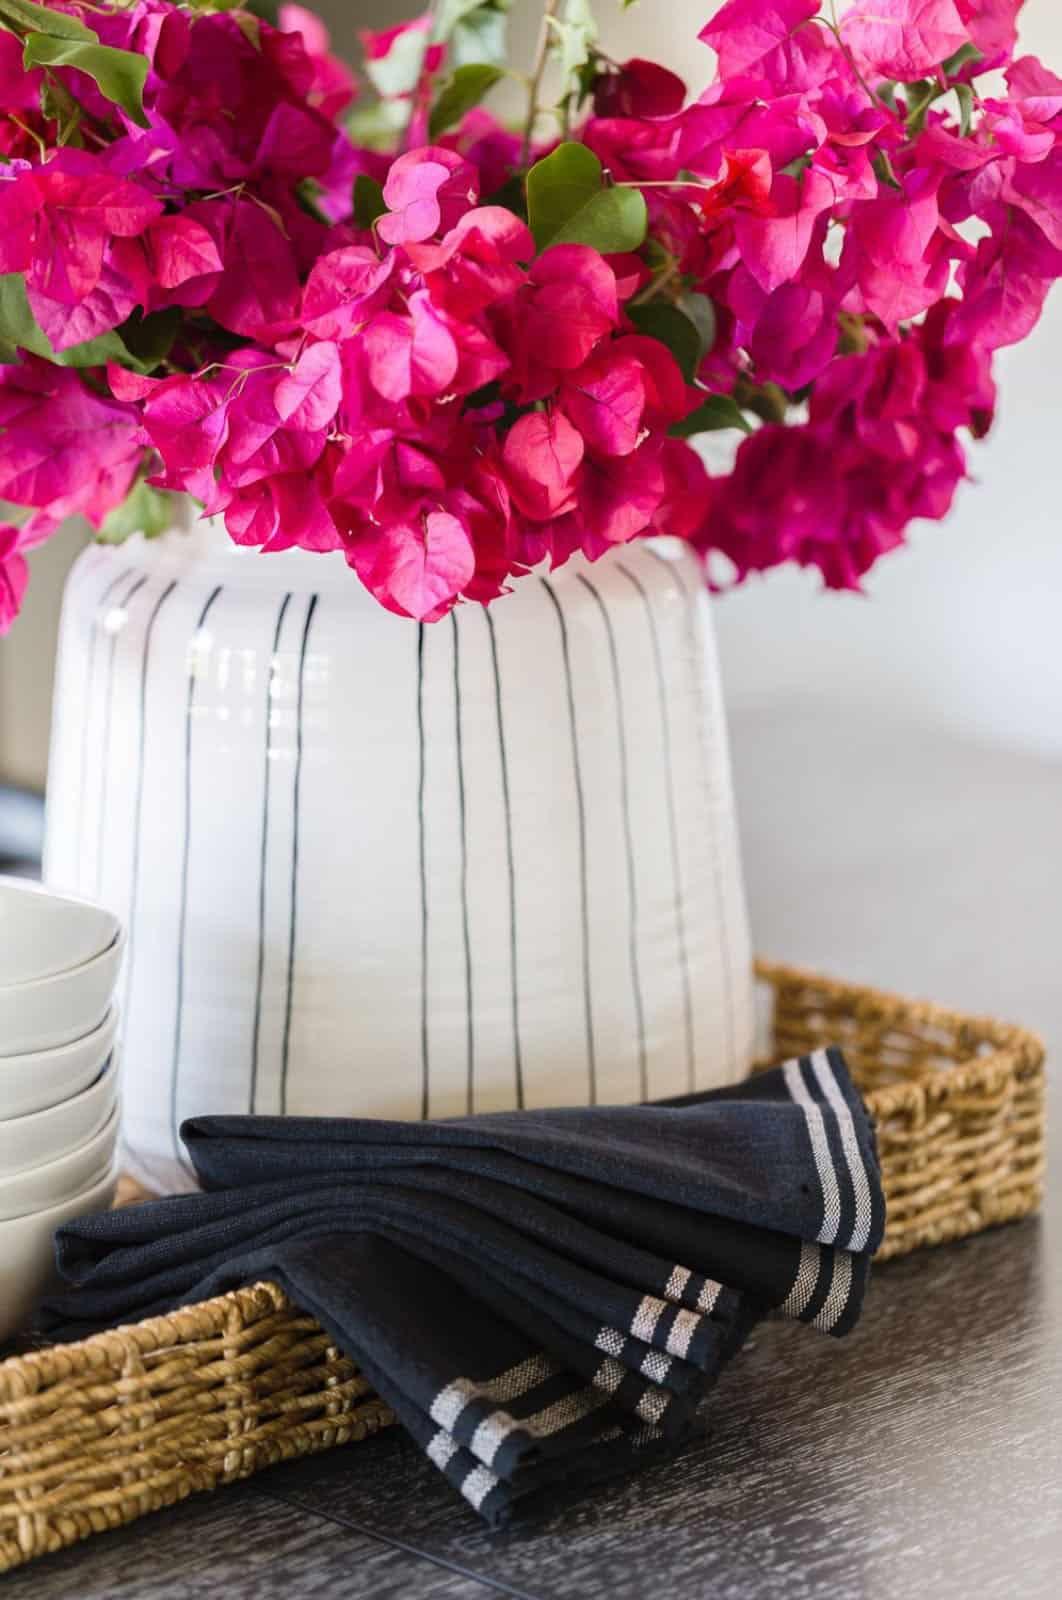 mediterranean-inspired-dining-room-table-decor